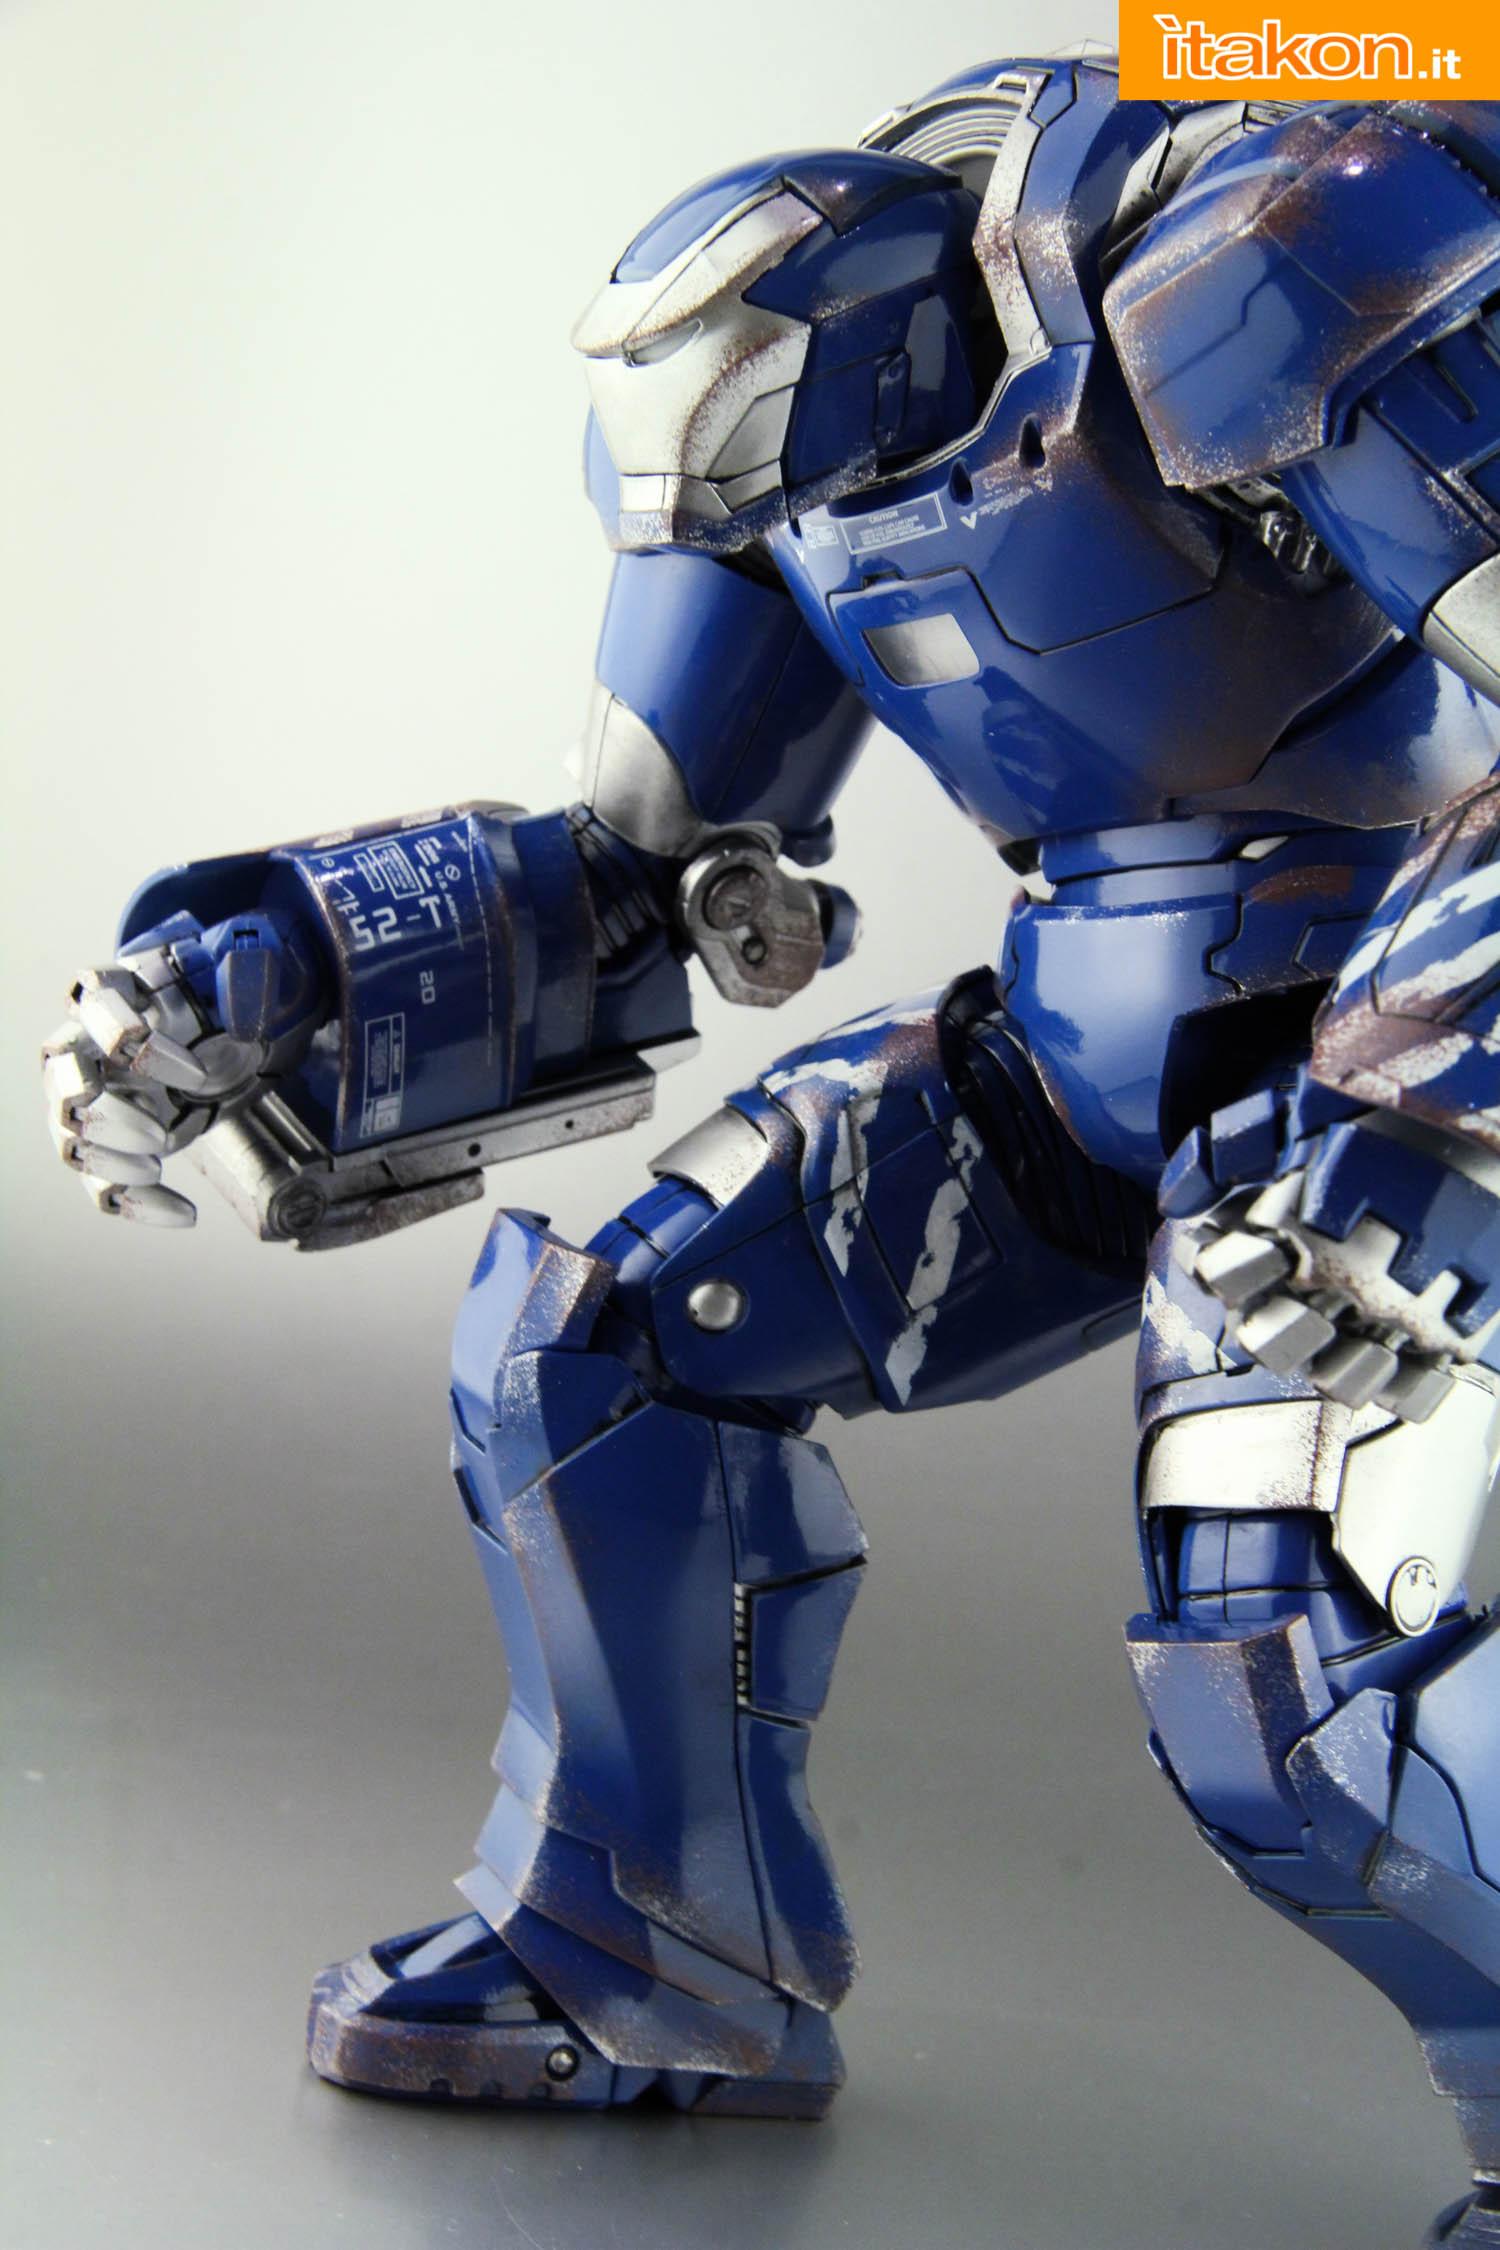 Link a comicave-igor-iron-man-figure-42